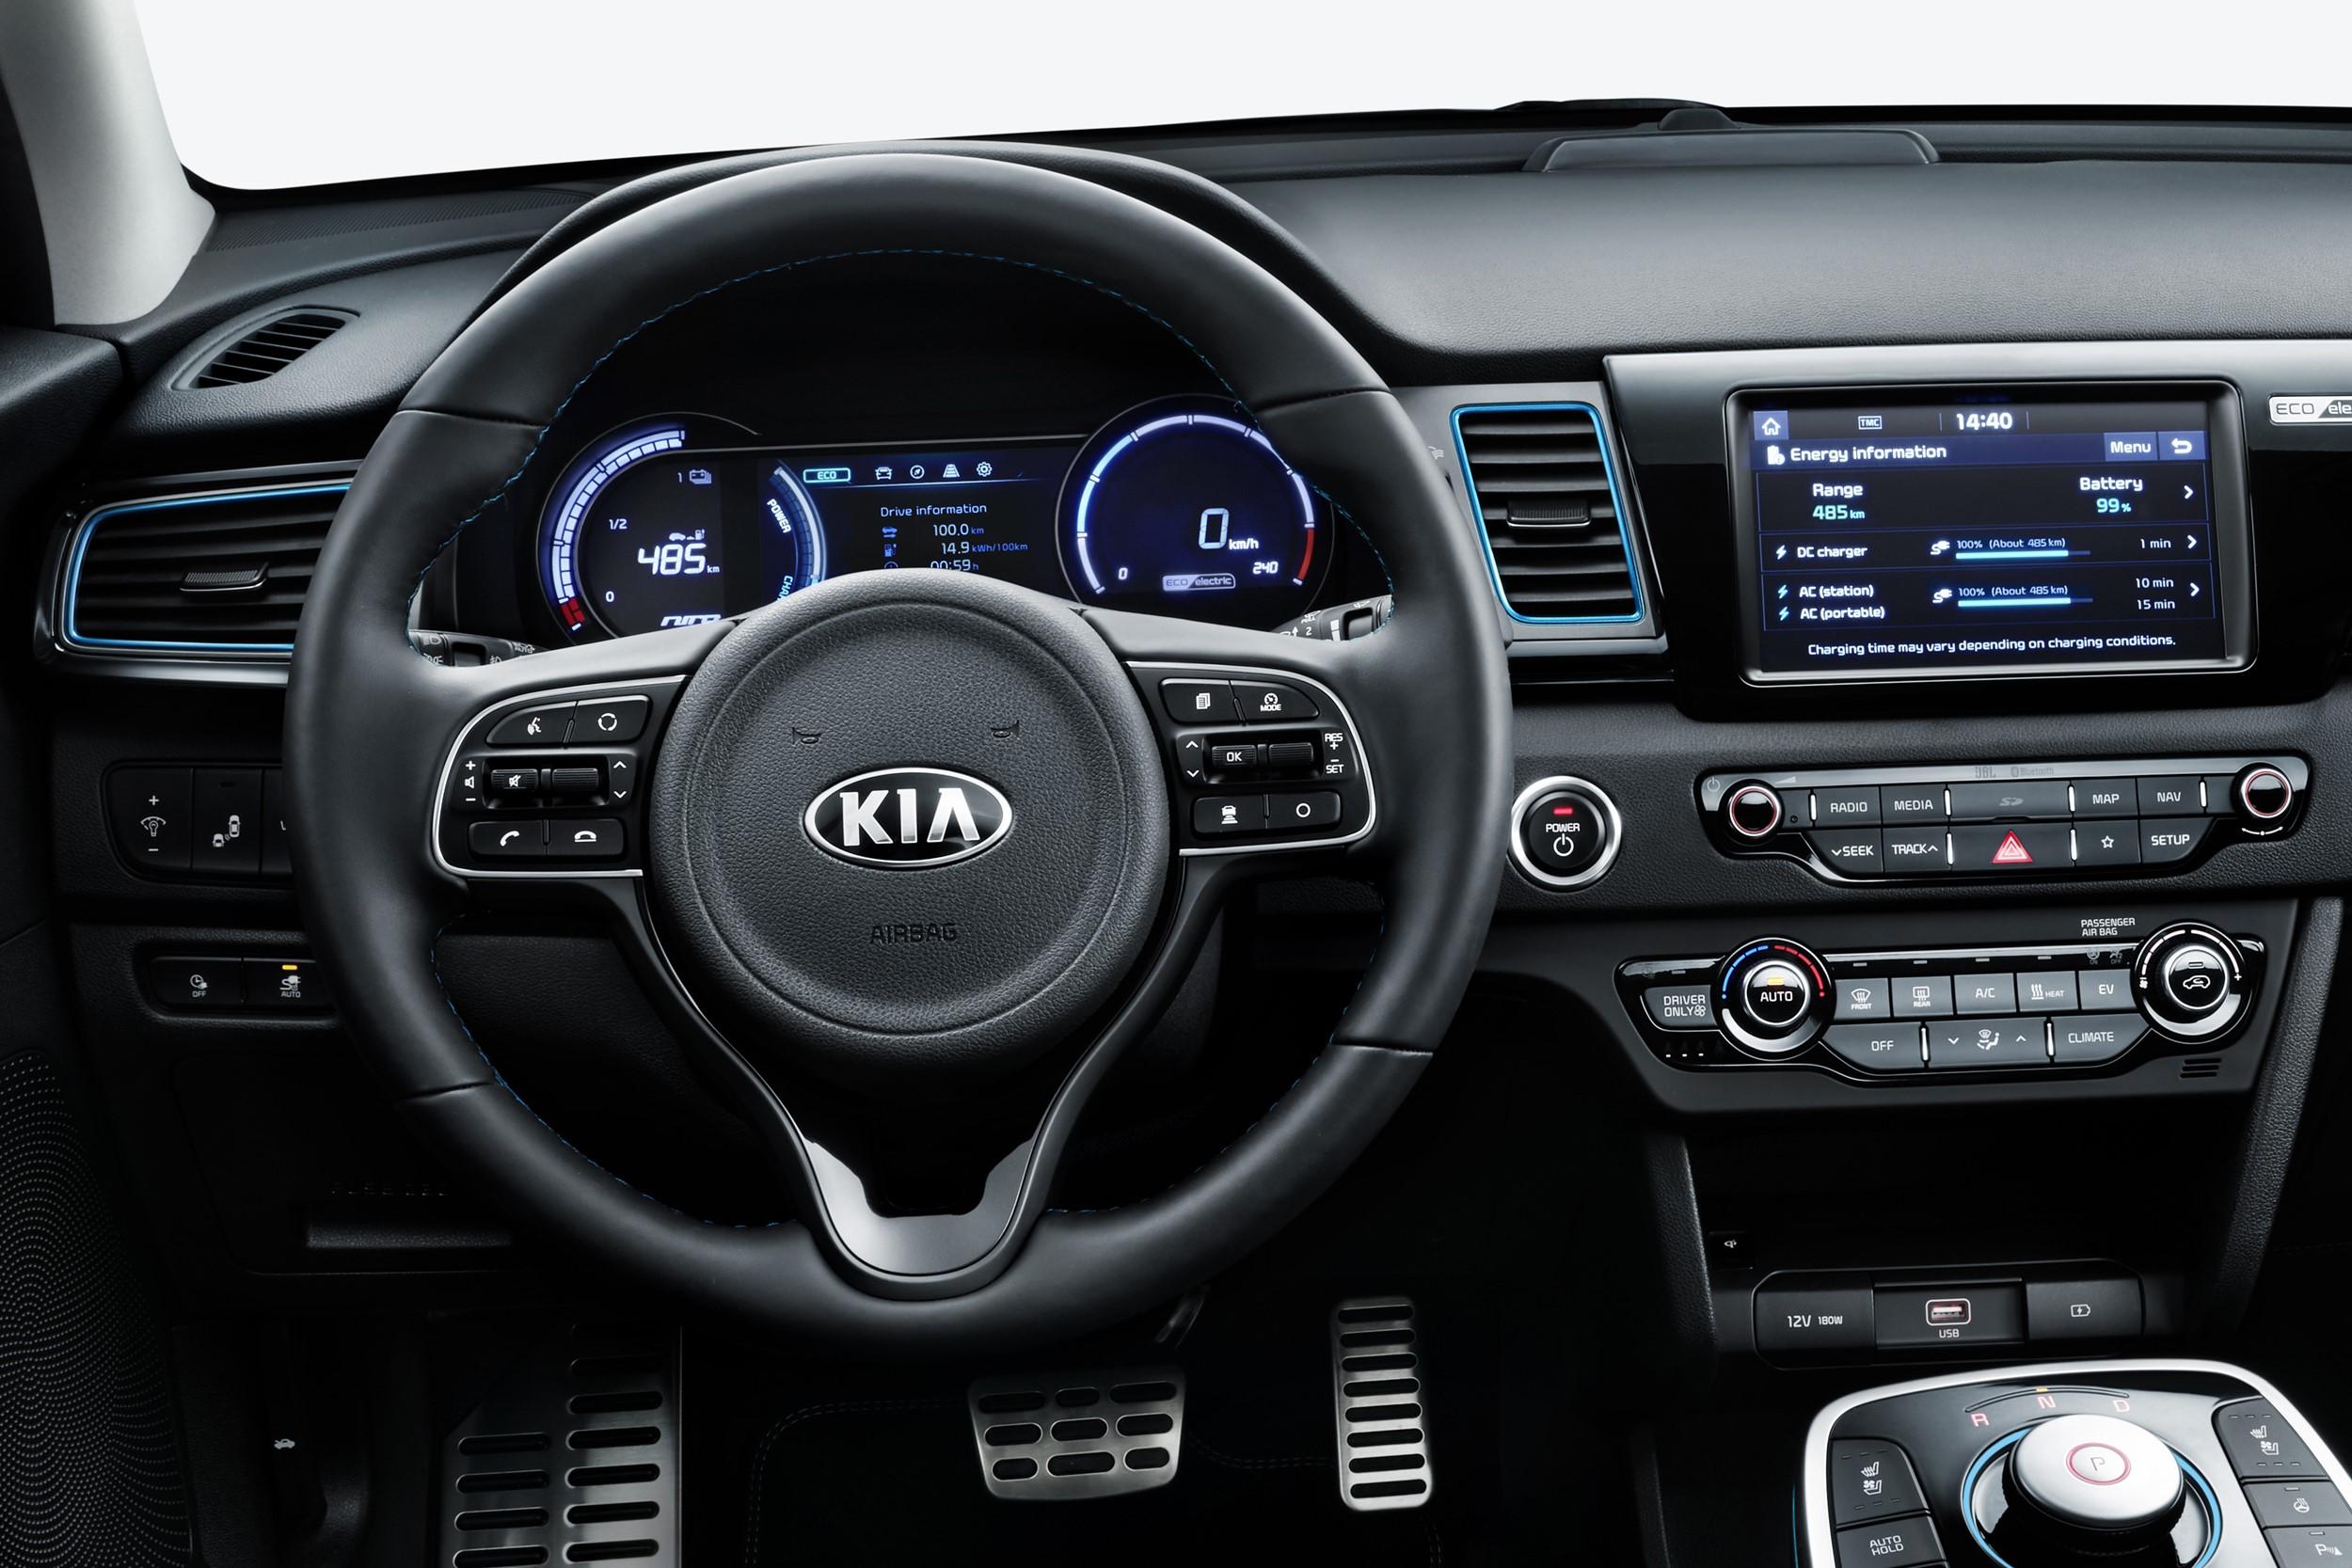 Kia Readies E Niro Pure Electric Suv With Range Of 301 Miles Updated